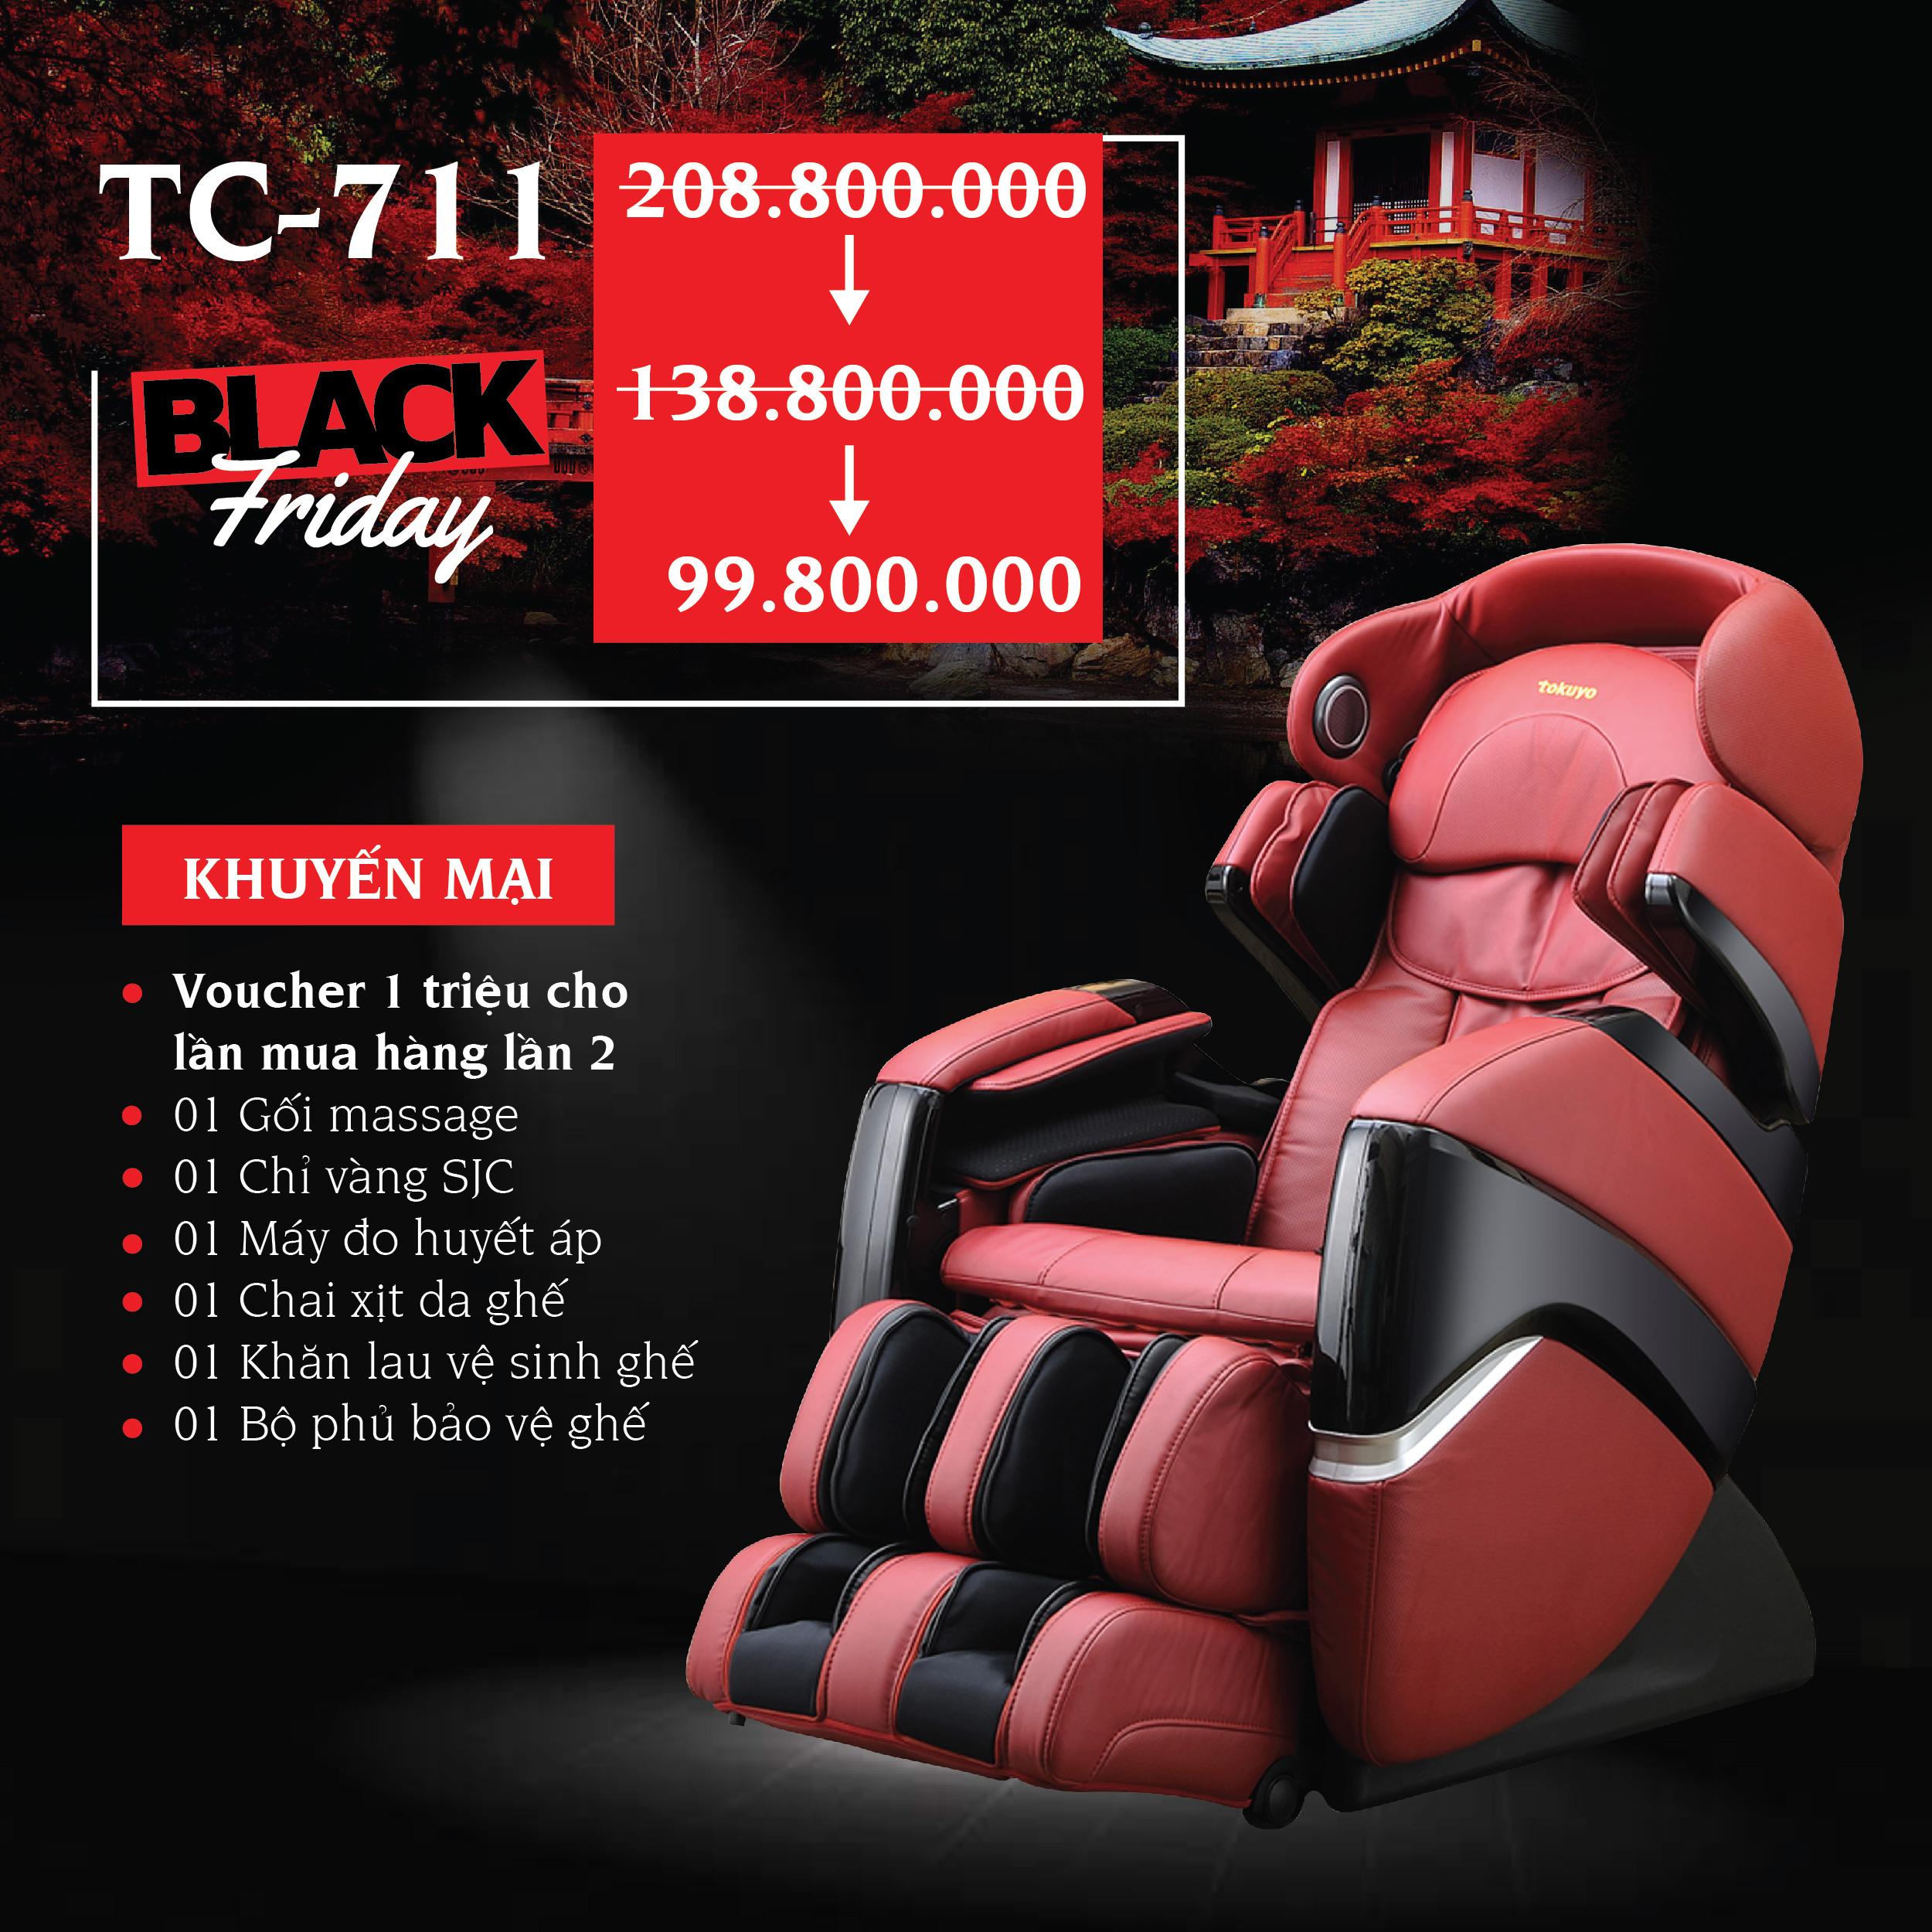 Ghế Massage 4D Tokuyo TC-711( Mẫu Tốt Nhất)